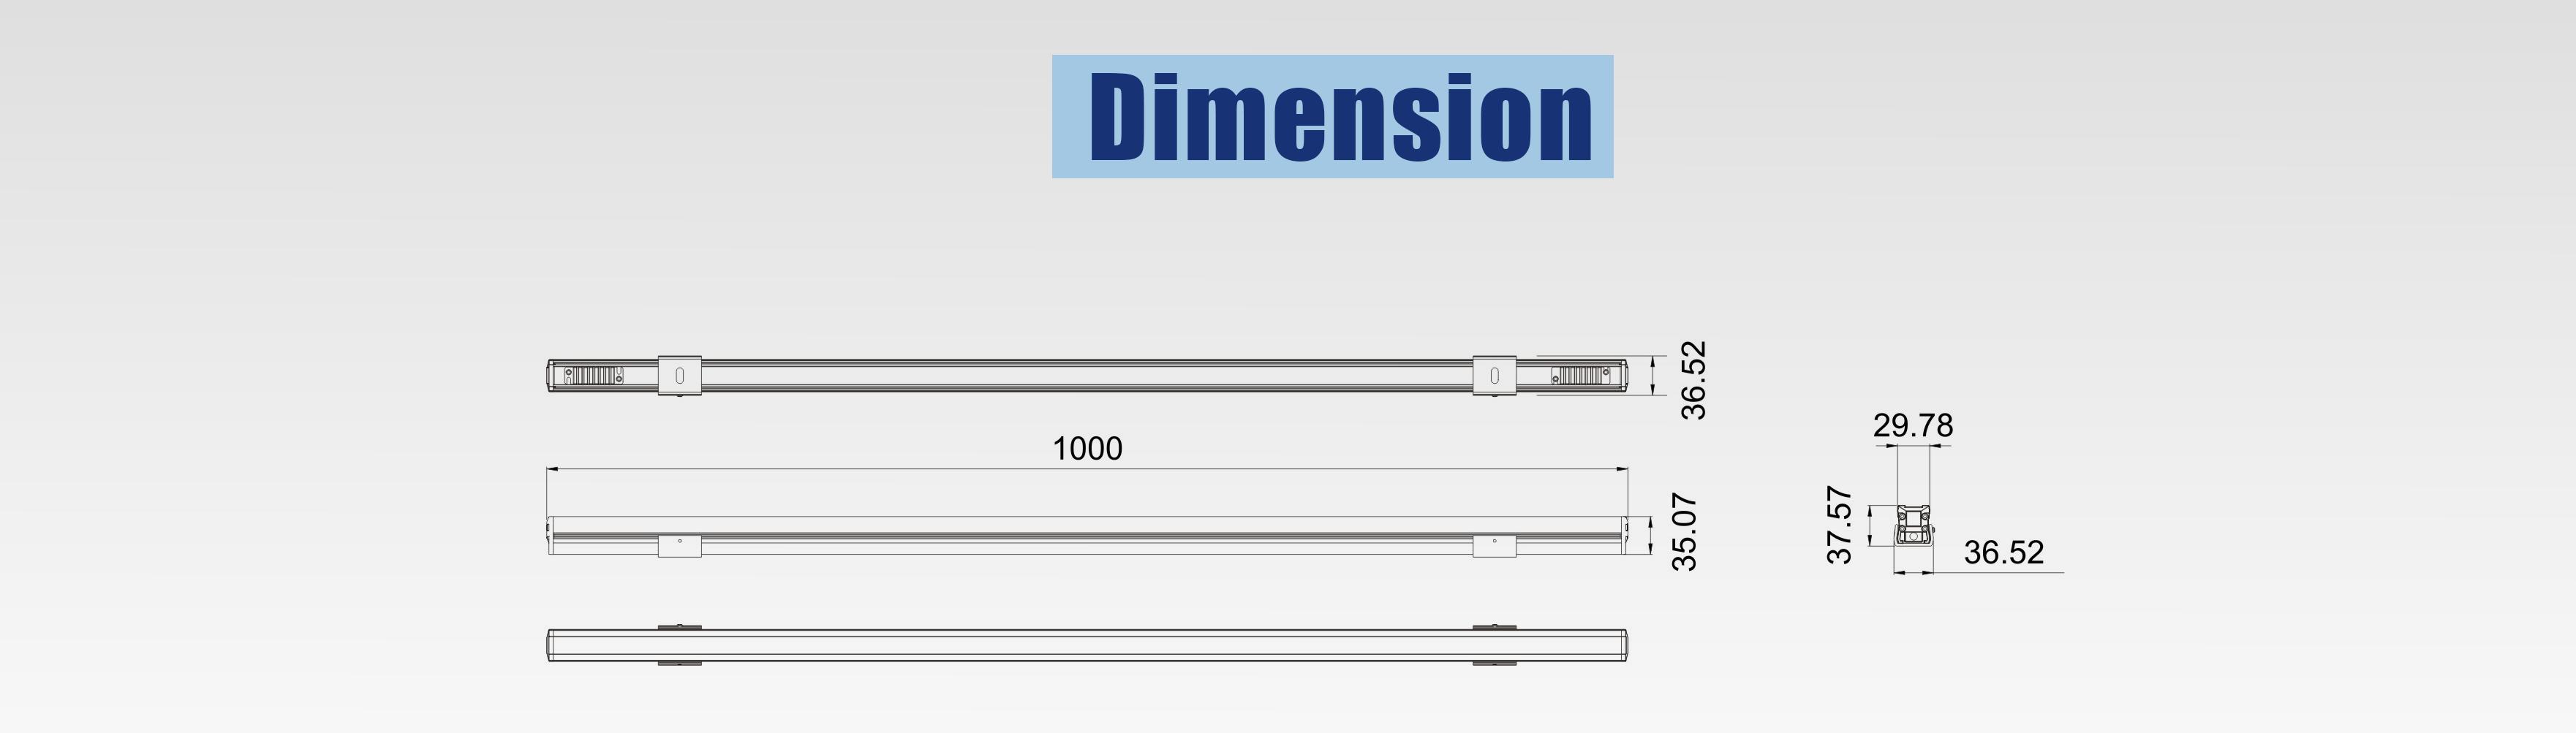 led rigid light dimension